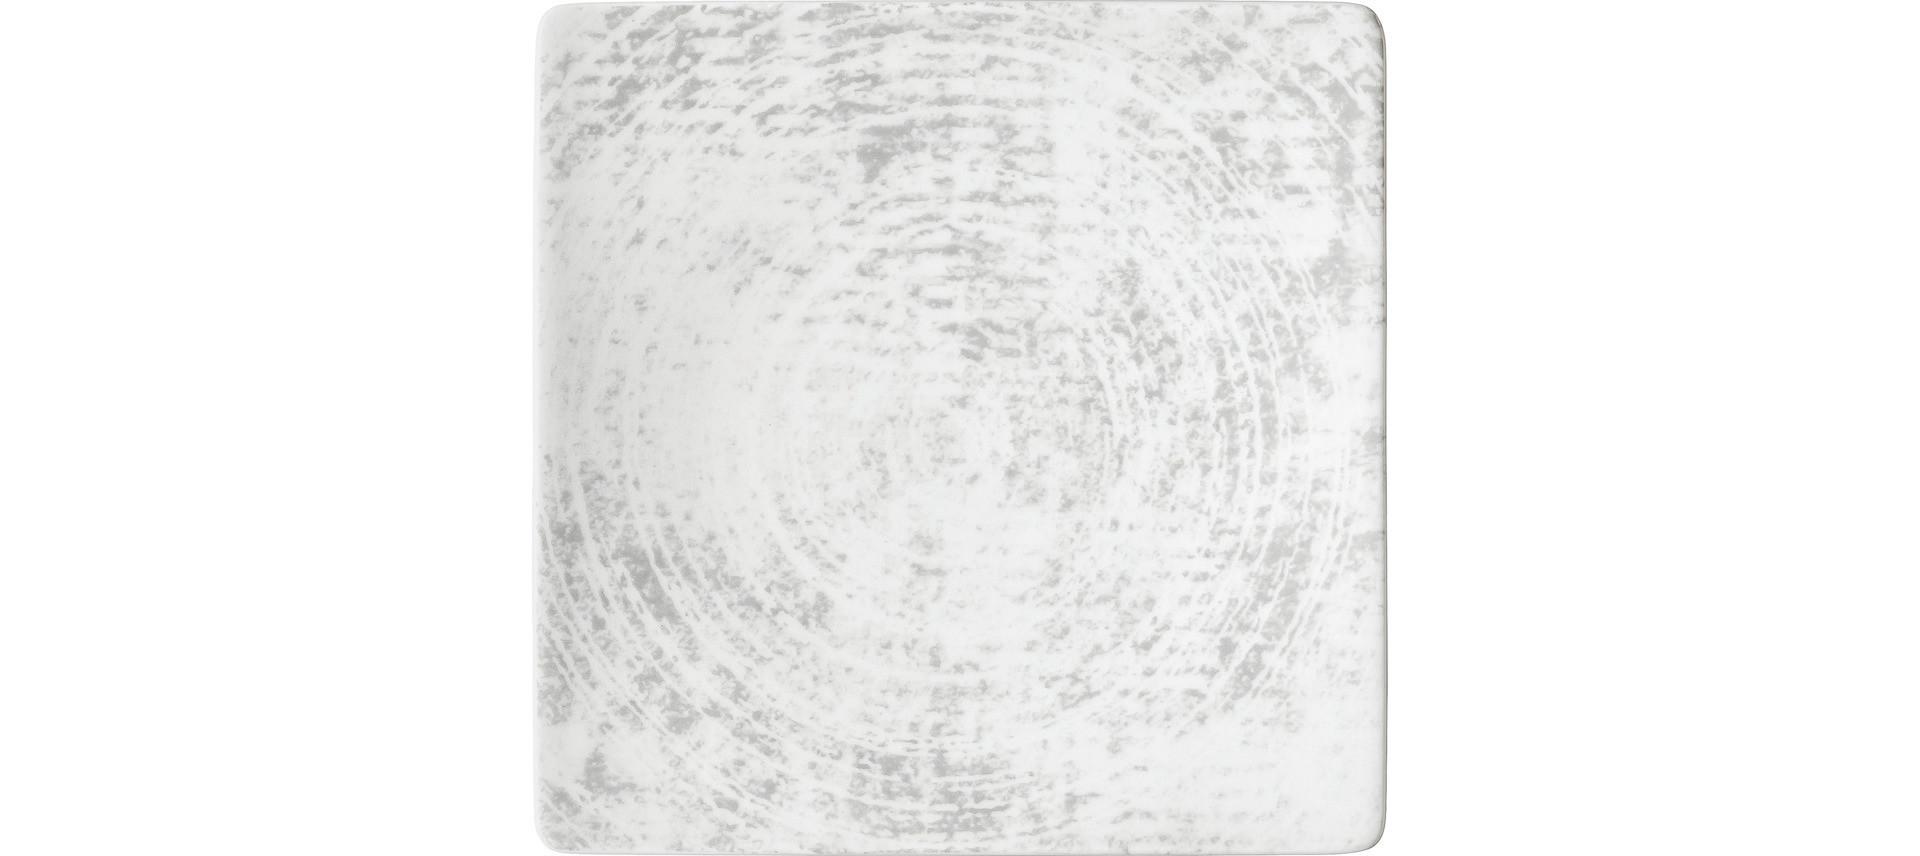 Shabby Chic, Coupteller halbtief eckig 166 x 166 mm Dekor 1